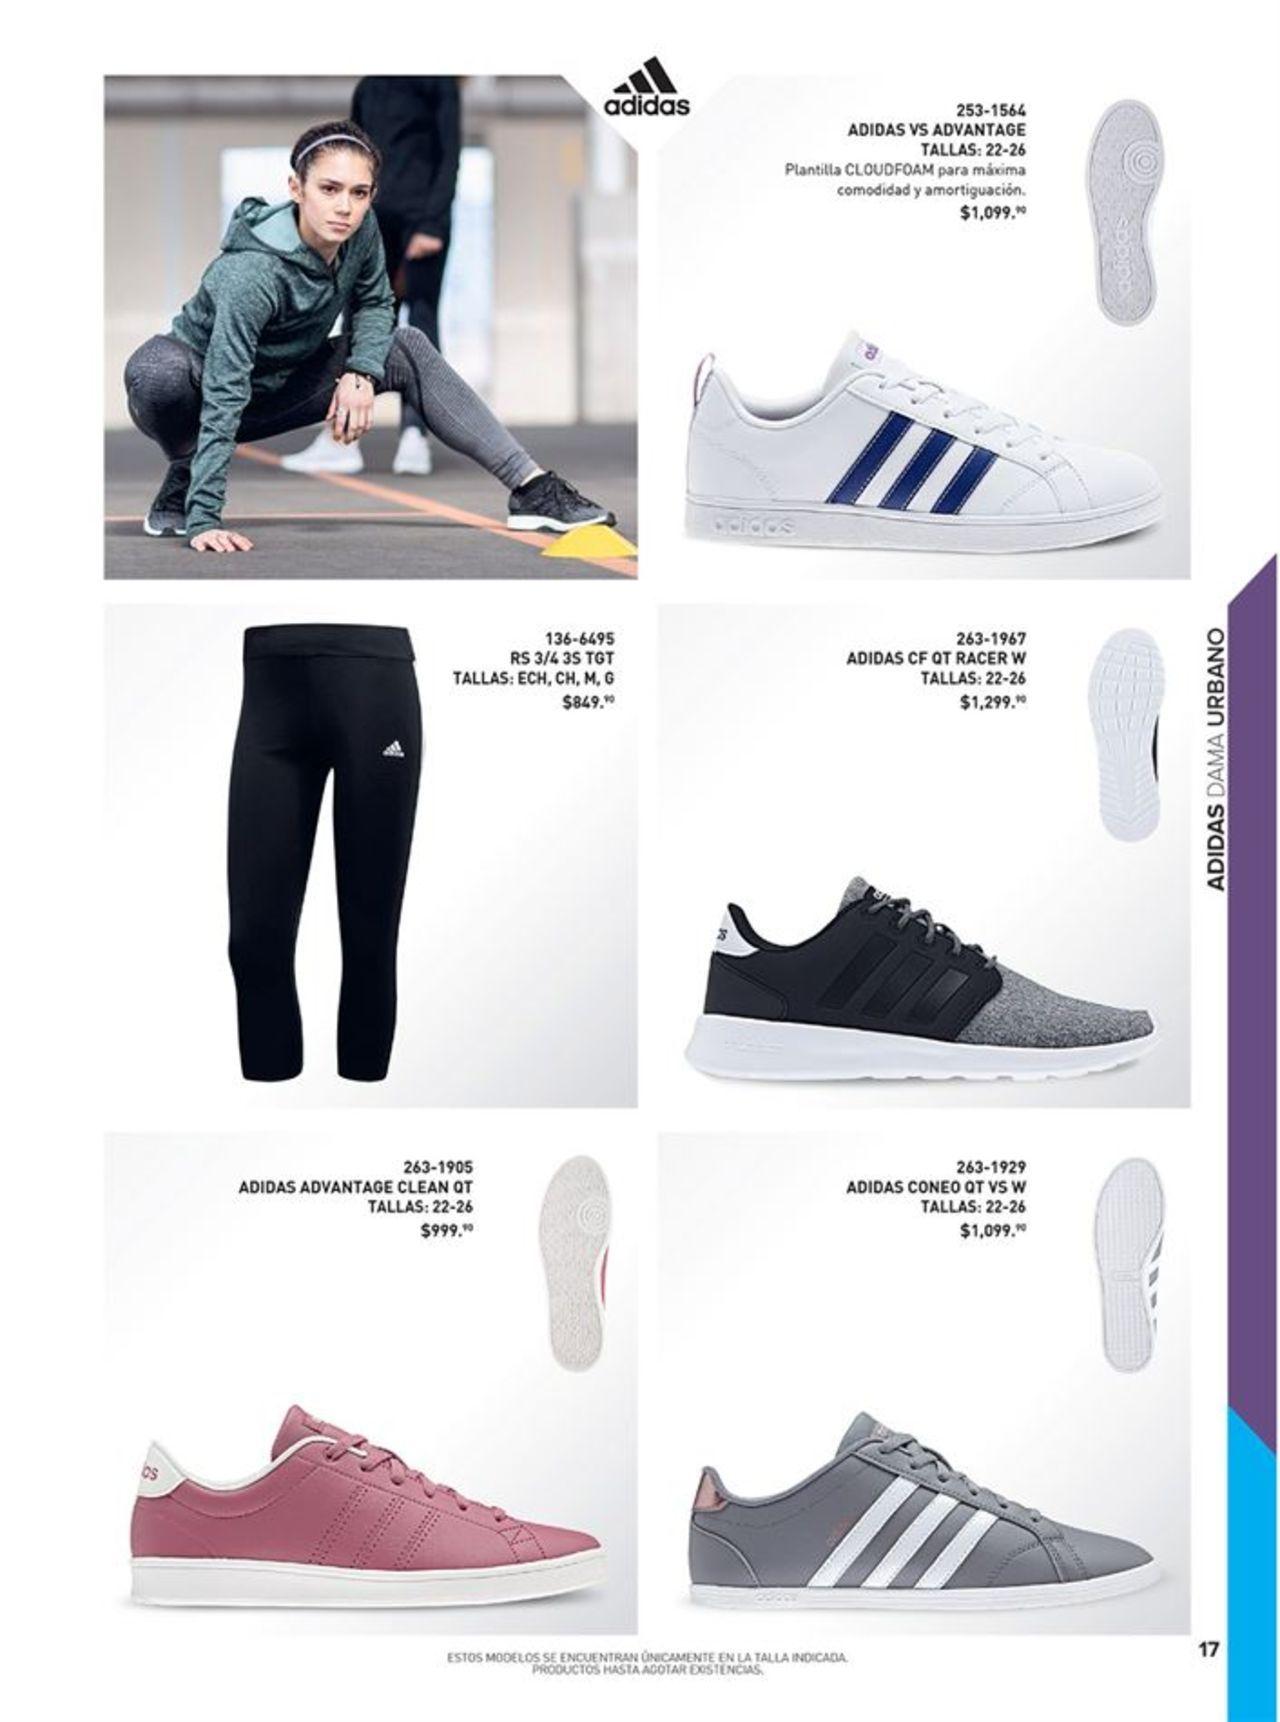 fcea4944da67c7 Andrea - Catálogo - Adidas válido desde el 28/10/2018 número de página 17